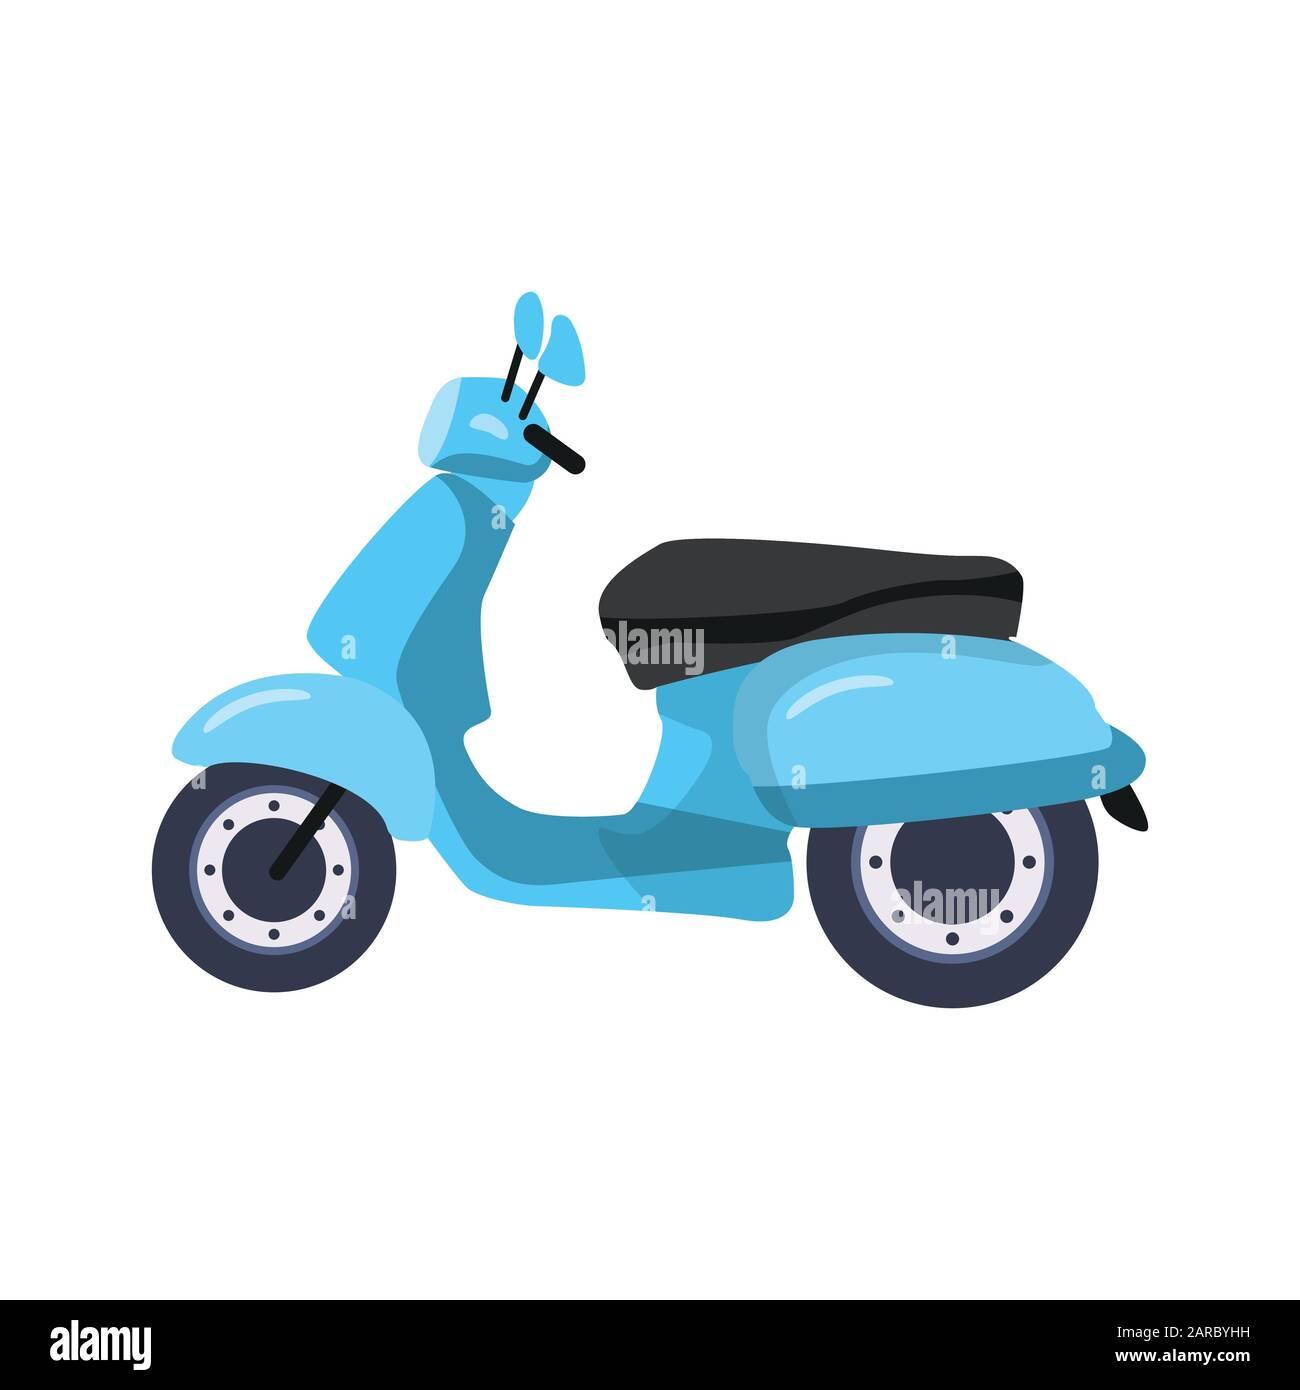 Blue Vintage Scooter Vector Illustration Stock Vector Image Art Alamy